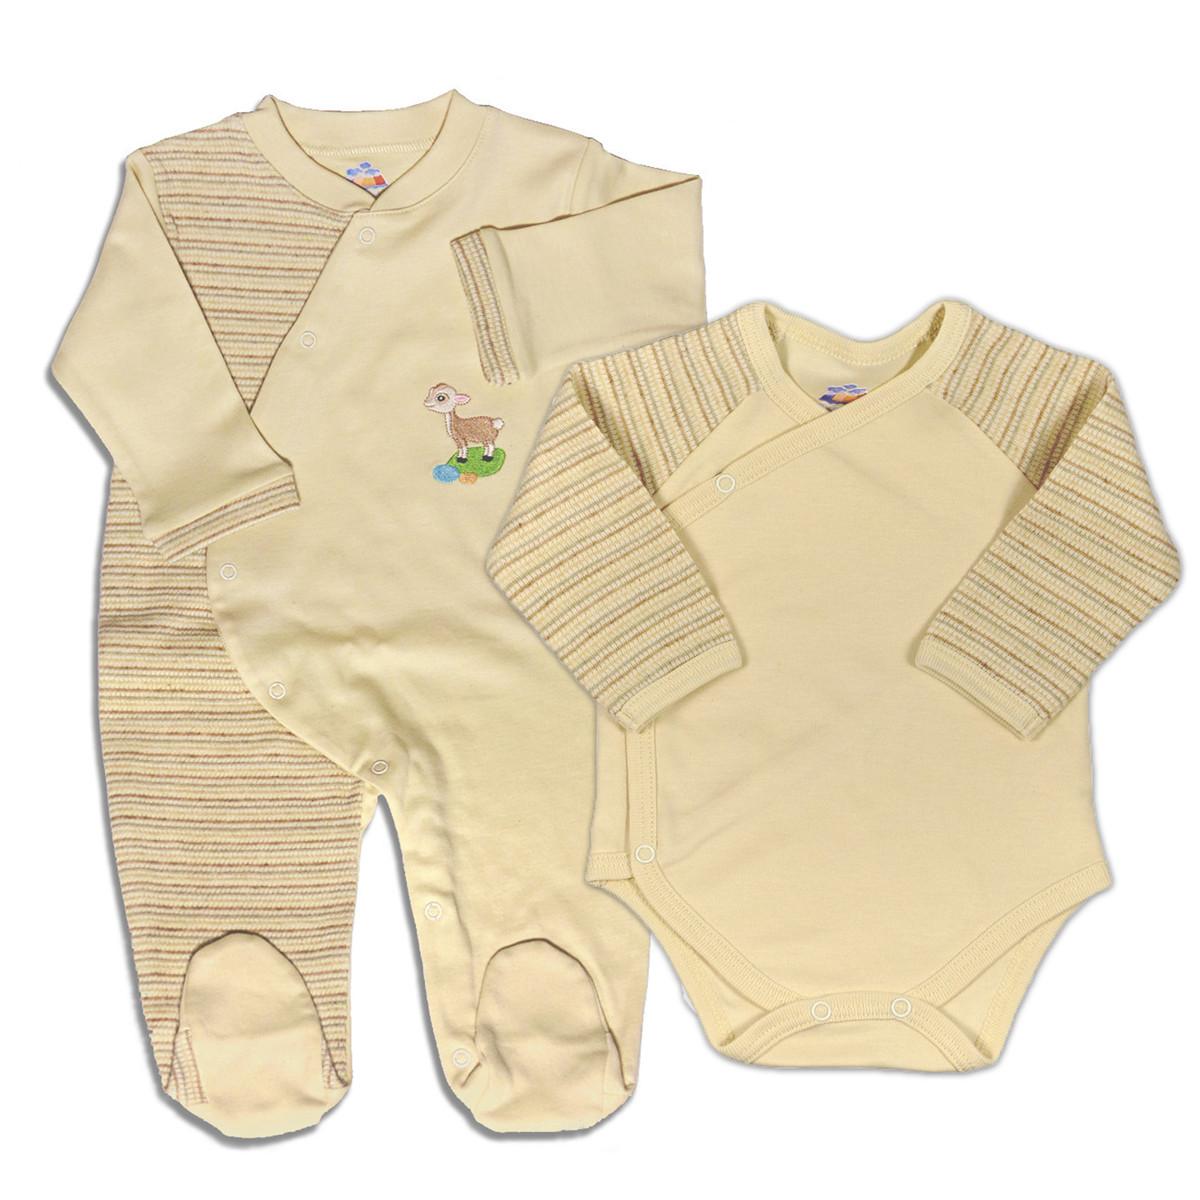 Chill n Feel - Bio Erstausstattung Body u. Schlafanzug Lama aus Pima Baumwolle (3)